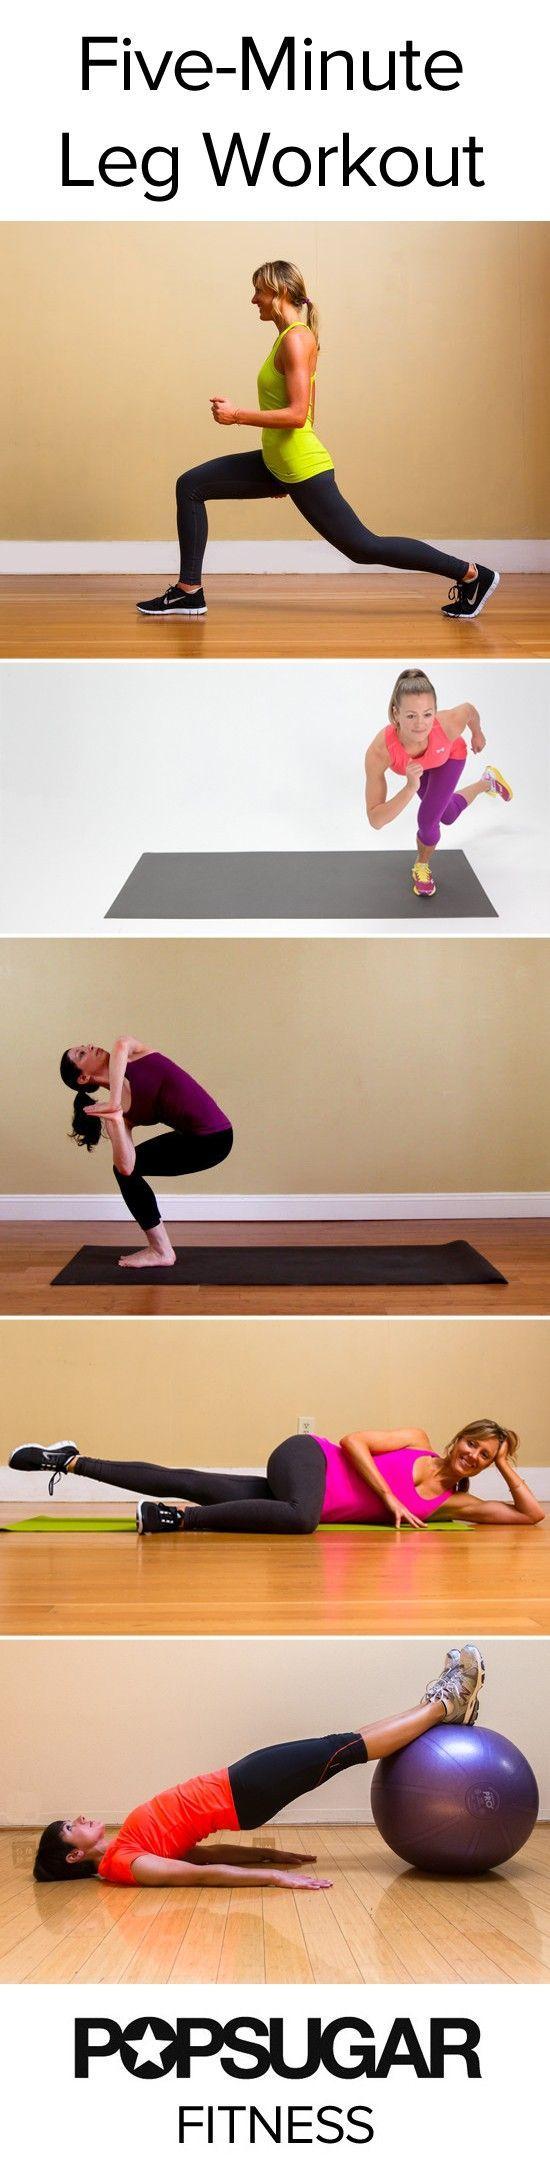 Five-minute leg workout routine! Perform each move for one minute. leg workout routine! Perform each move for one minute.